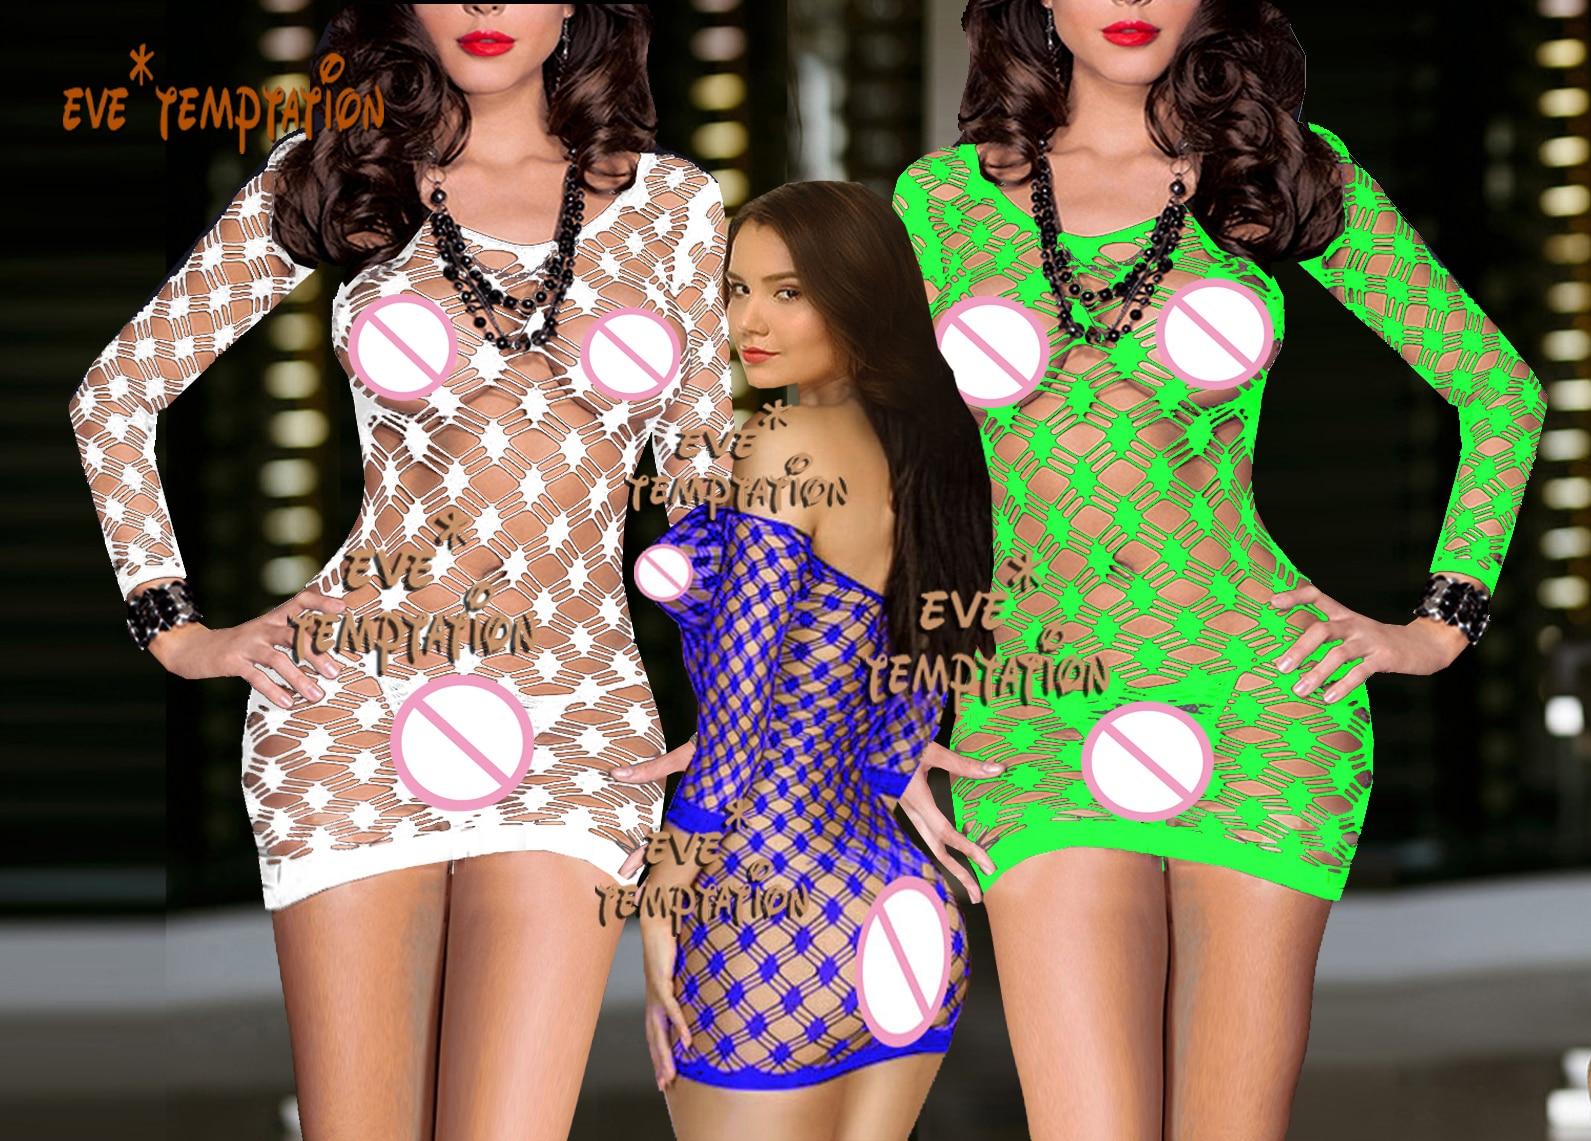 Sexy crochet Fish Net Lingerie Babydoll vestido ropa interior trajes de dormir trajes Chemises camisón manga larga 6208